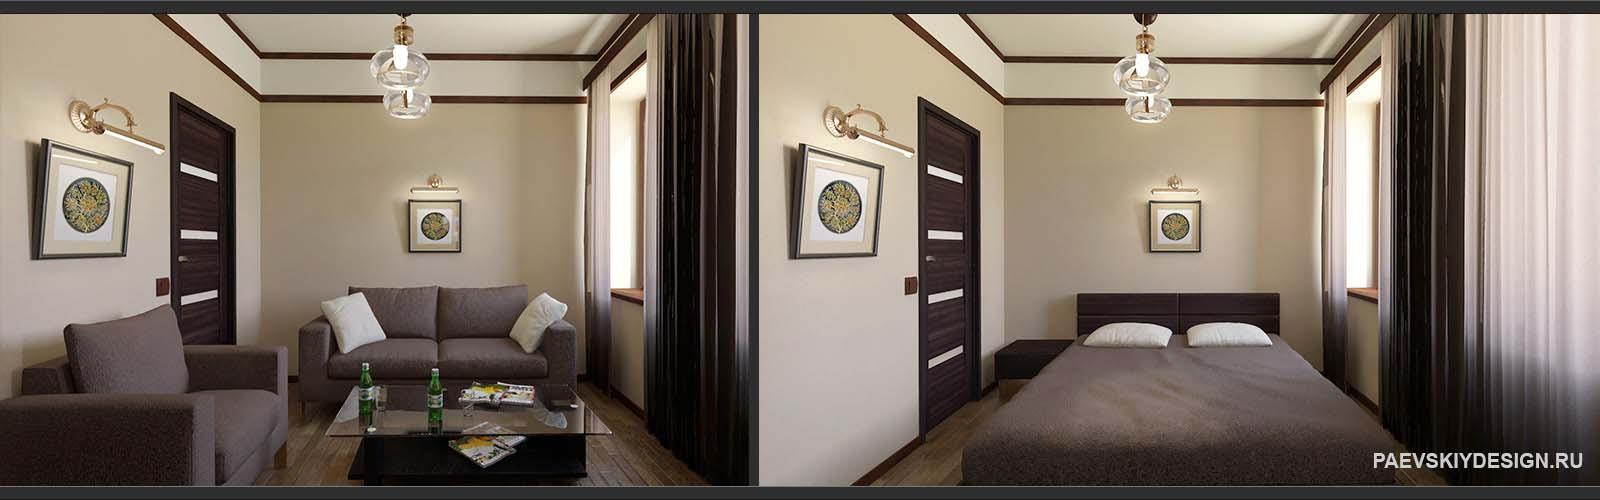 Концепция комнаты для гостей